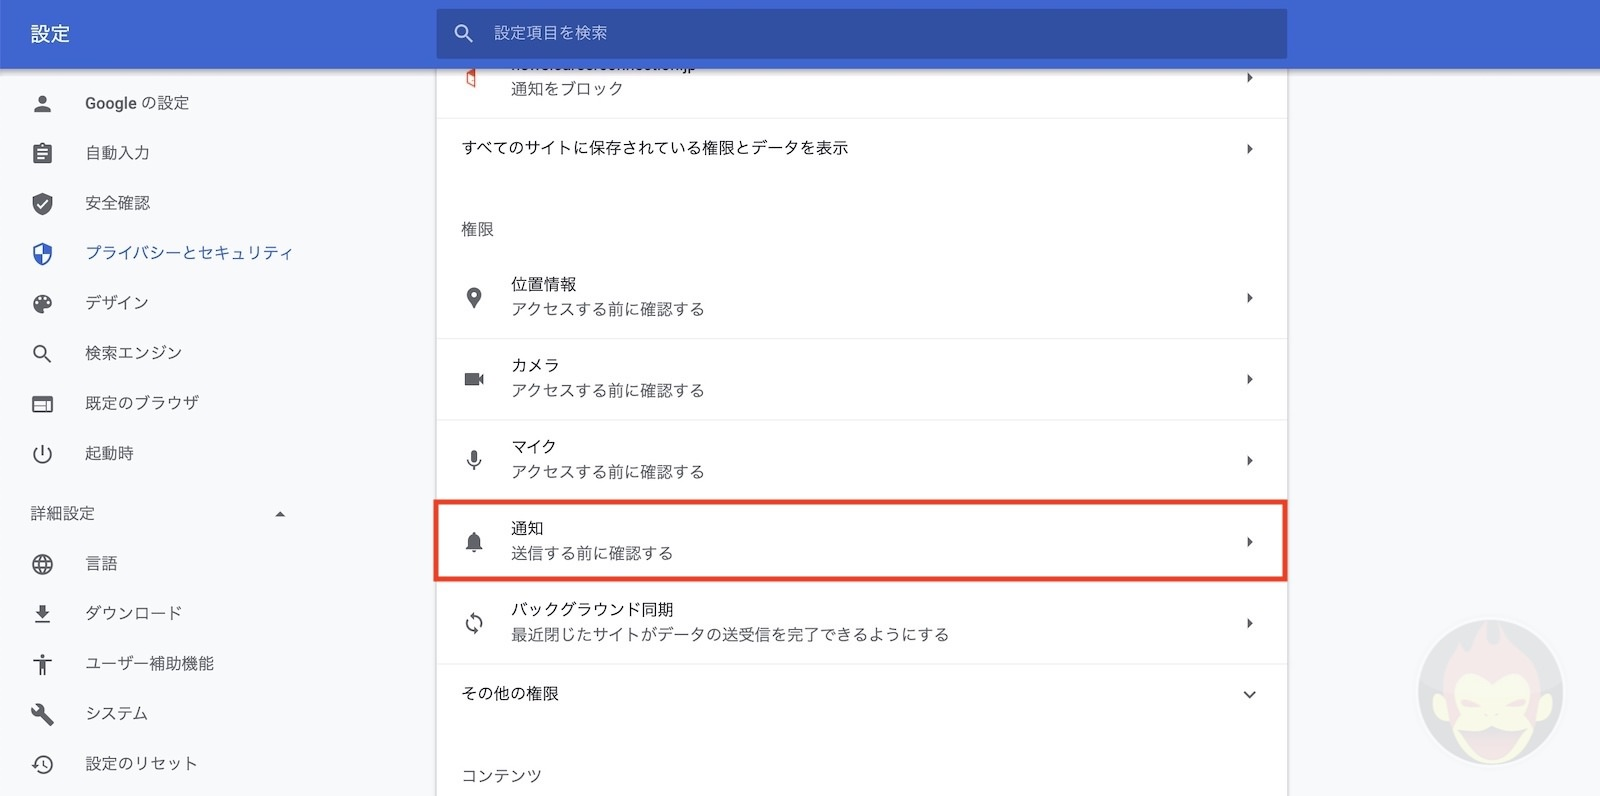 Blocking notifications on Chrome 01